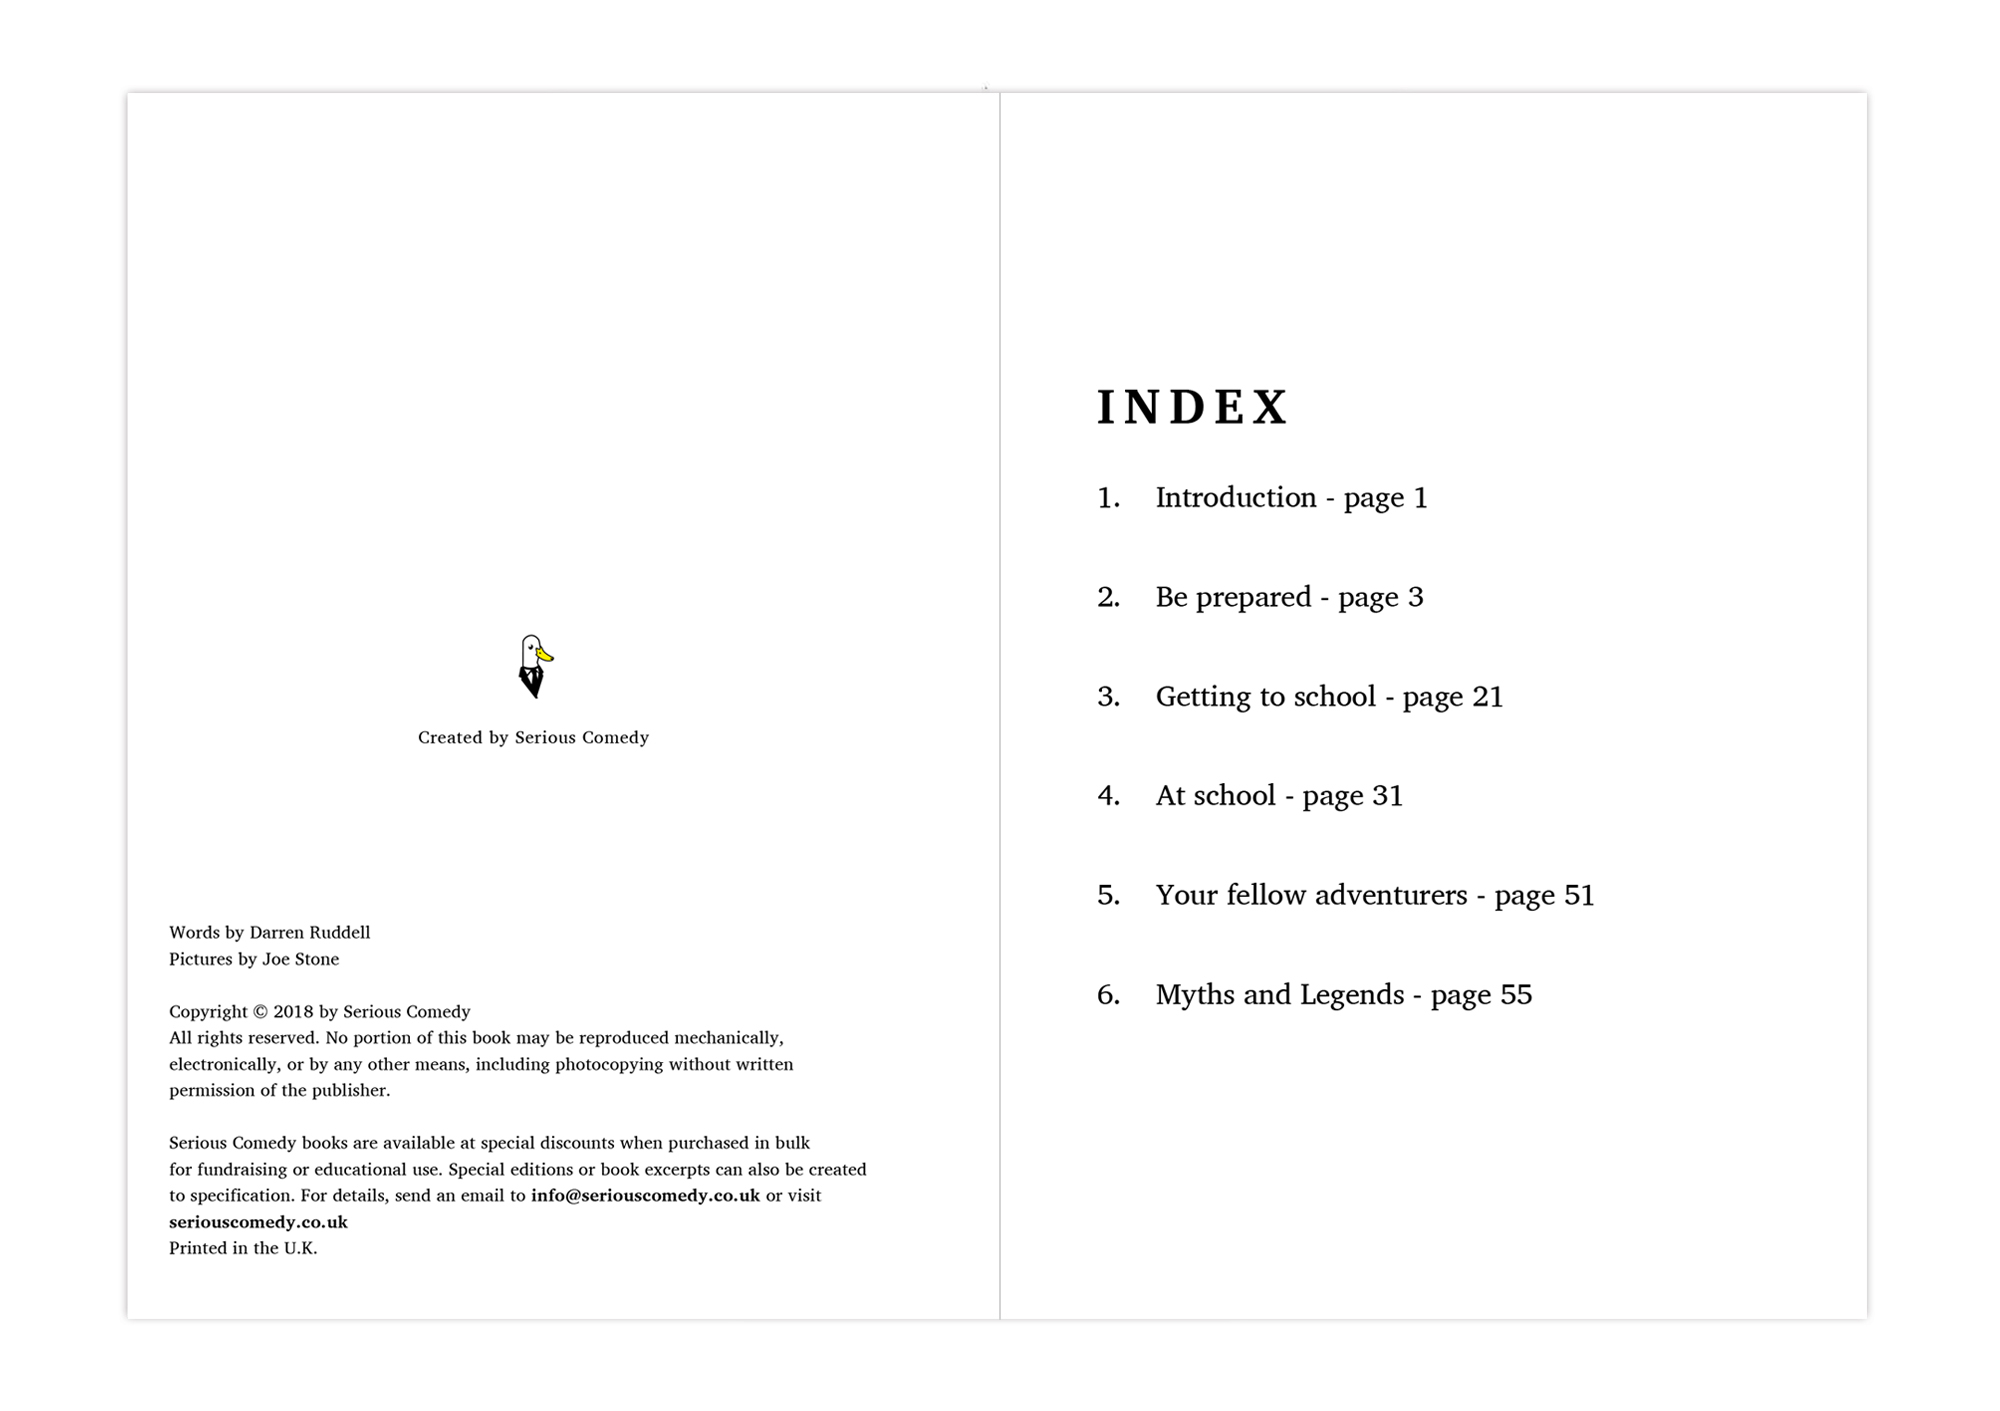 SG-Spead-introduction.jpg